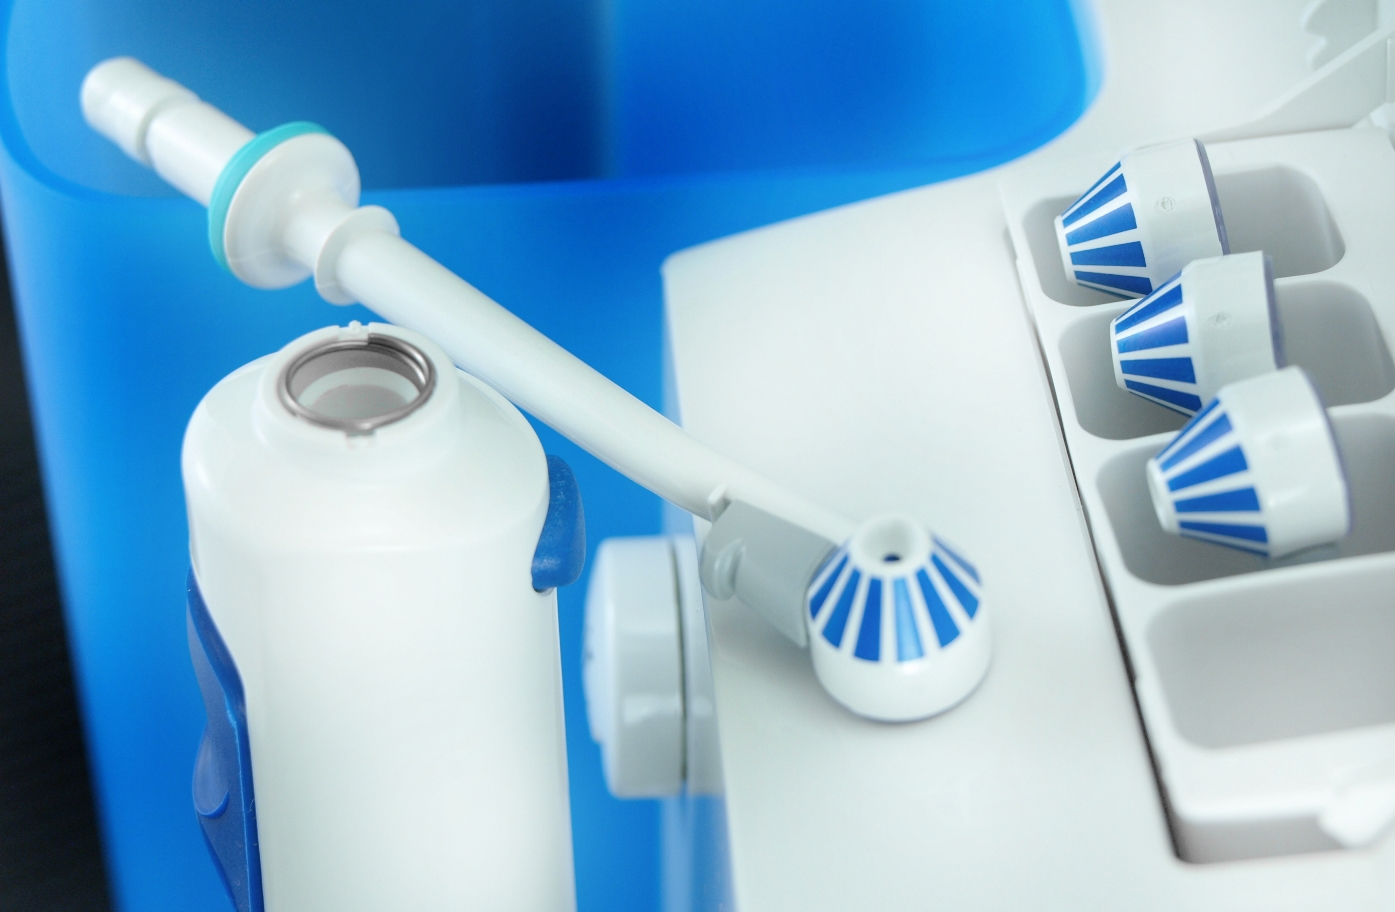 Oral b professionalcare oxyjet 4 фотография